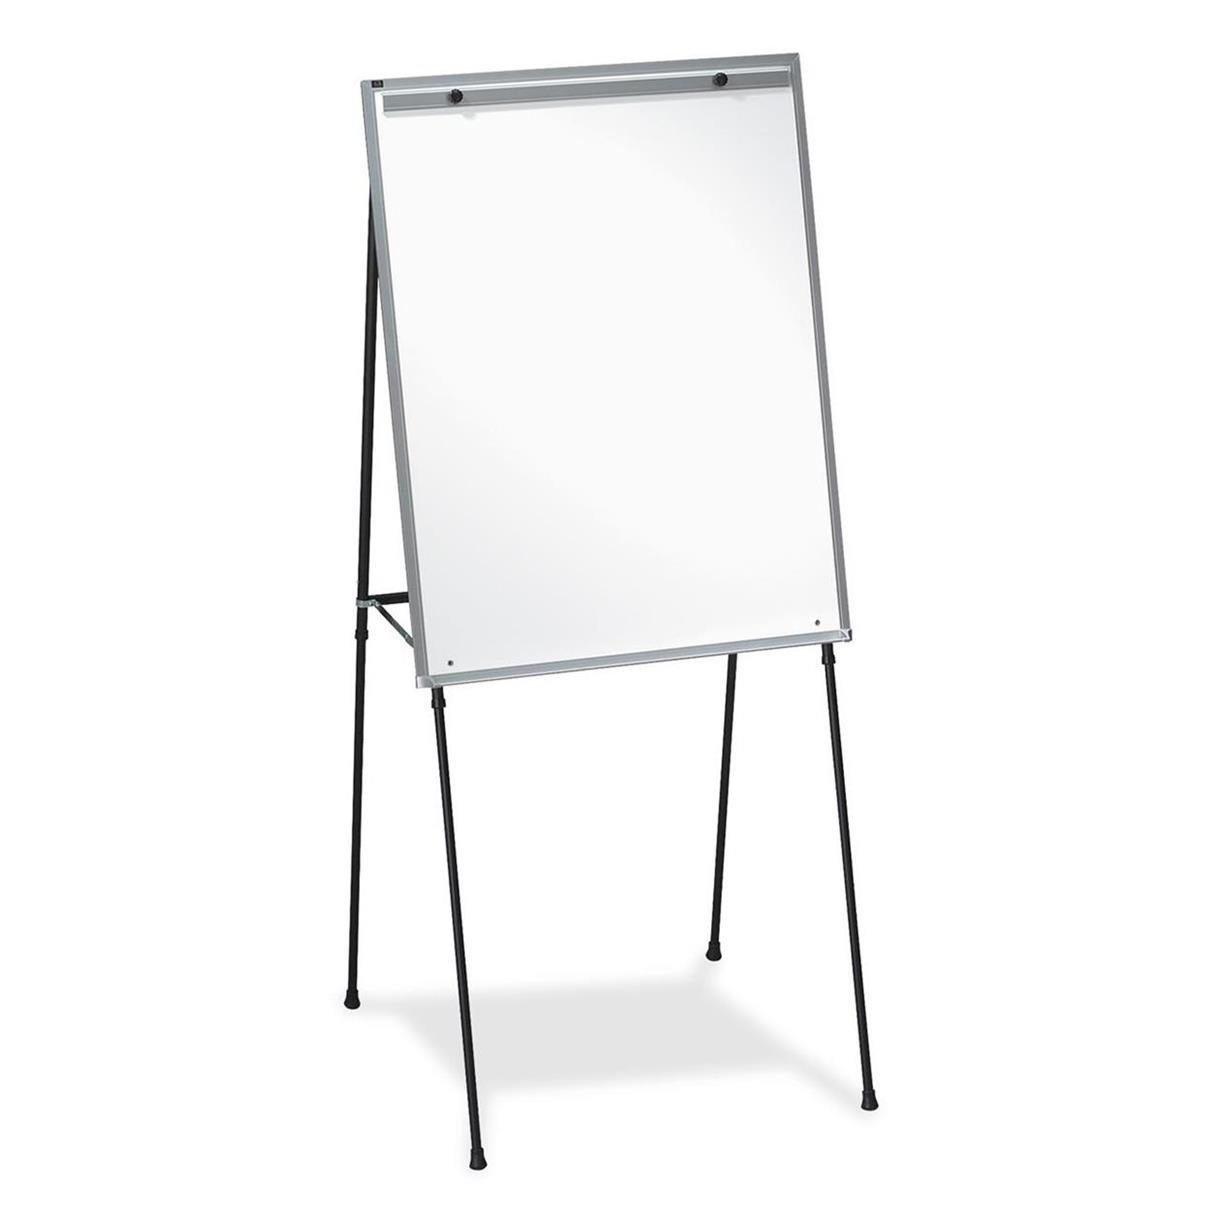 28 x 34 dry erase board writting whiteboad adjustable floor stand school office ebay. Black Bedroom Furniture Sets. Home Design Ideas